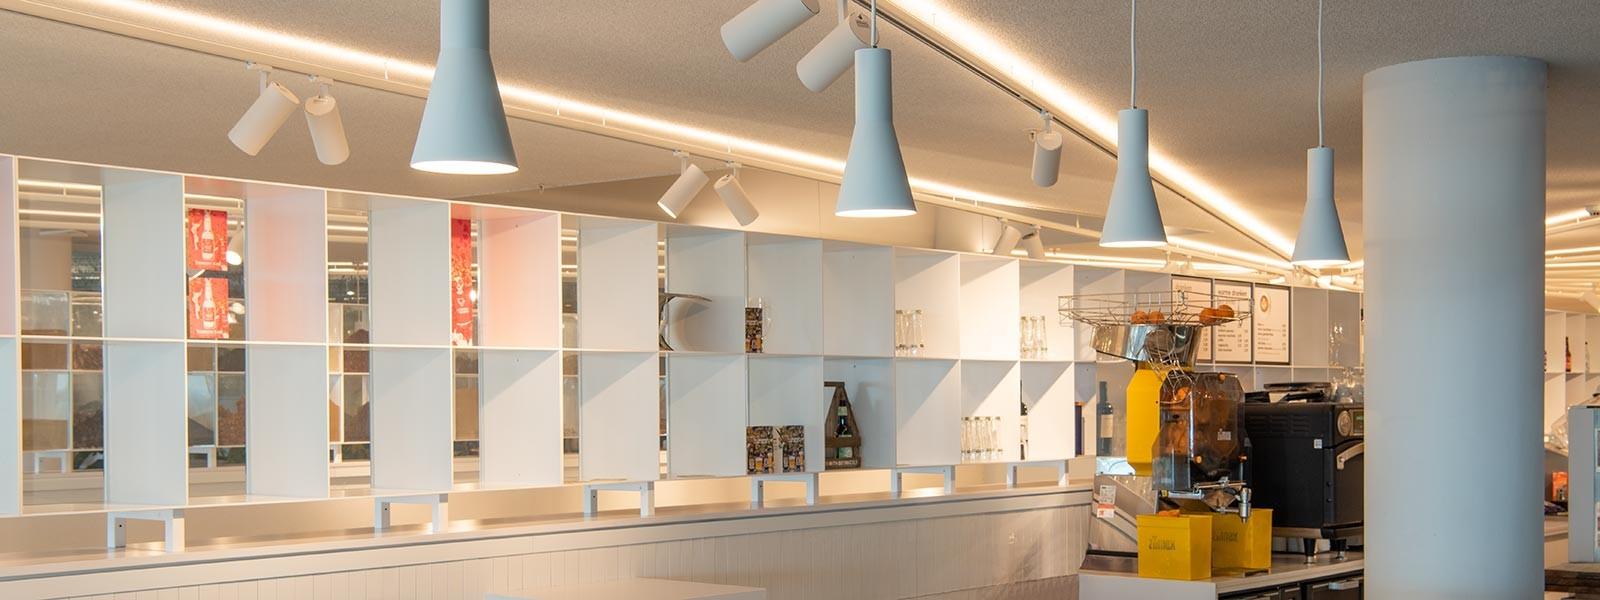 Restaurant Babel (OBA), Amsterdam